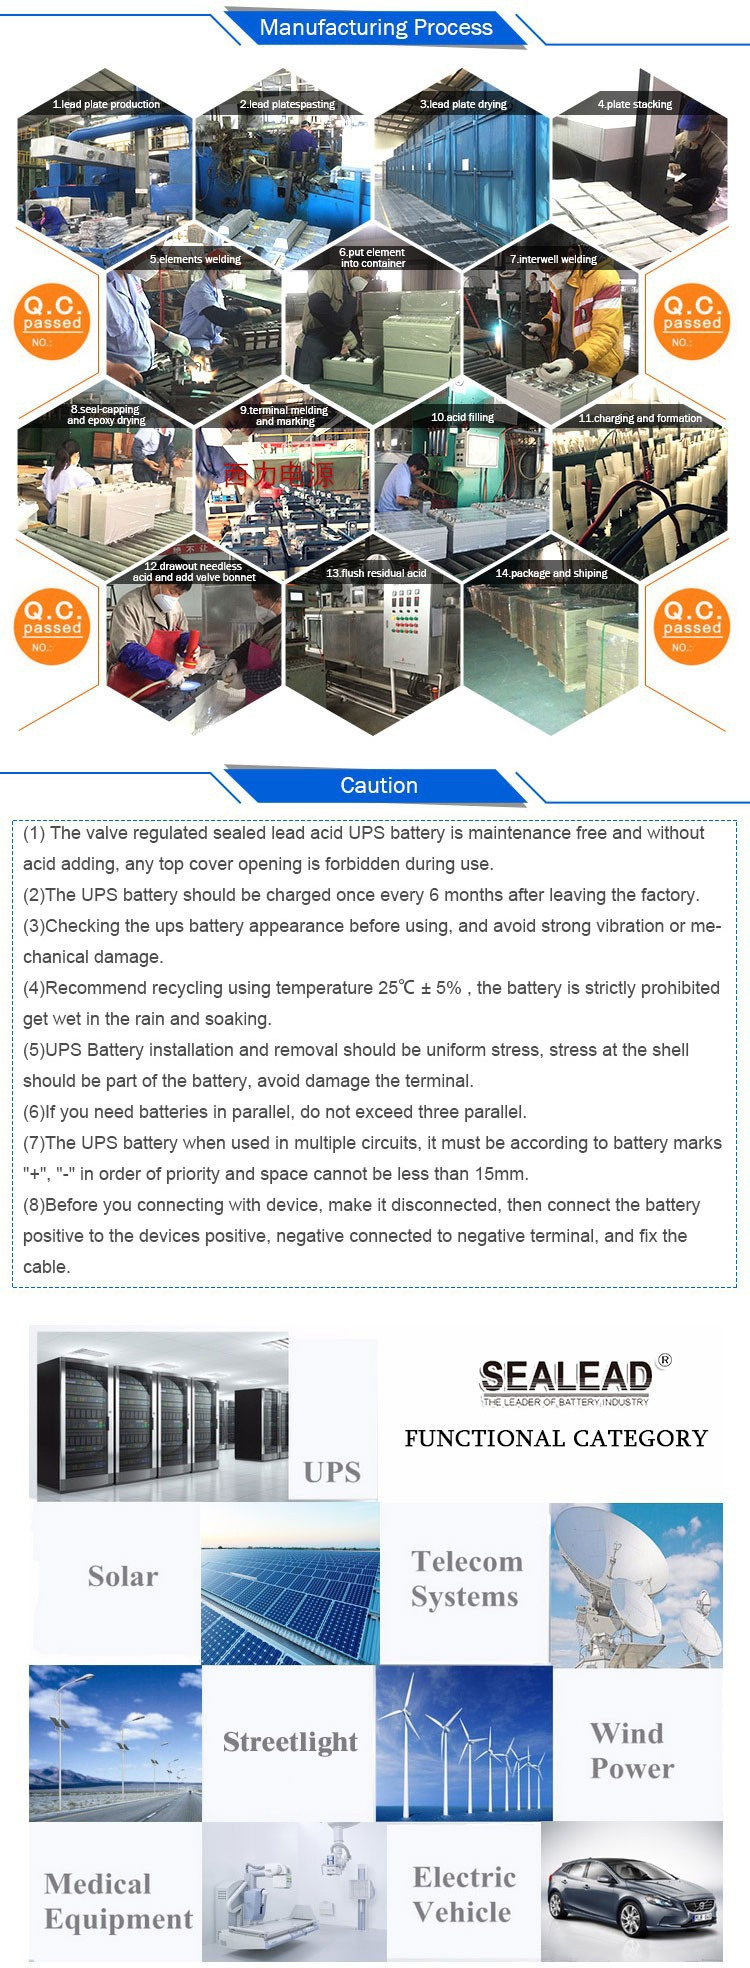 Ihram Kids For Sale Dubai: 2018 Dubai Hot Sale 4v 4.0ah Sealed Lead Acid Inverter